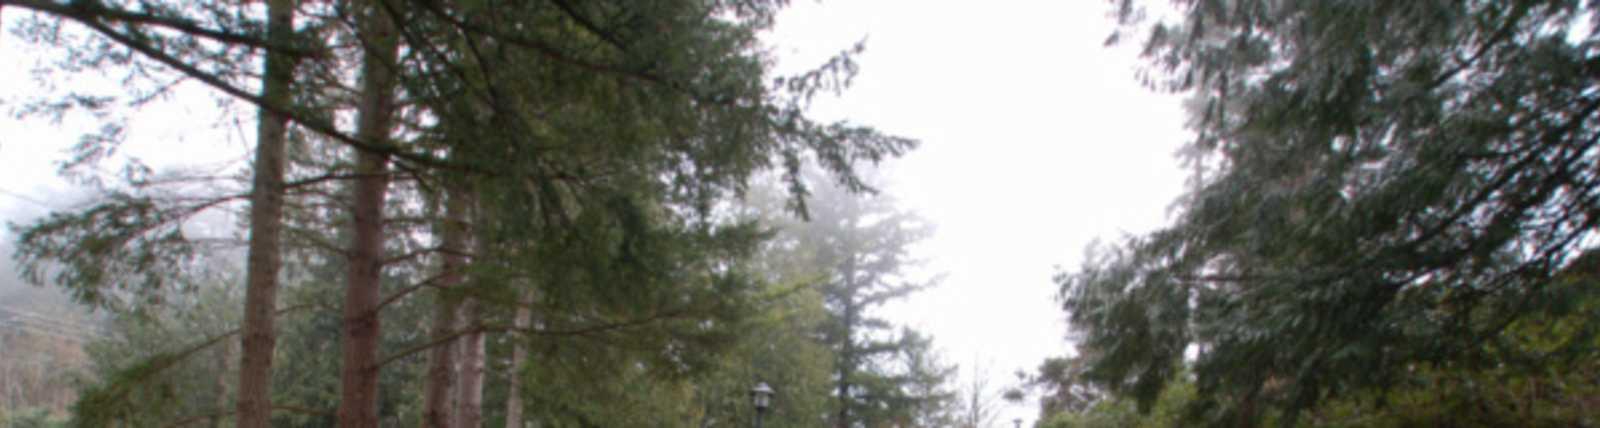 Snoqualmie_Falls-5.jpg